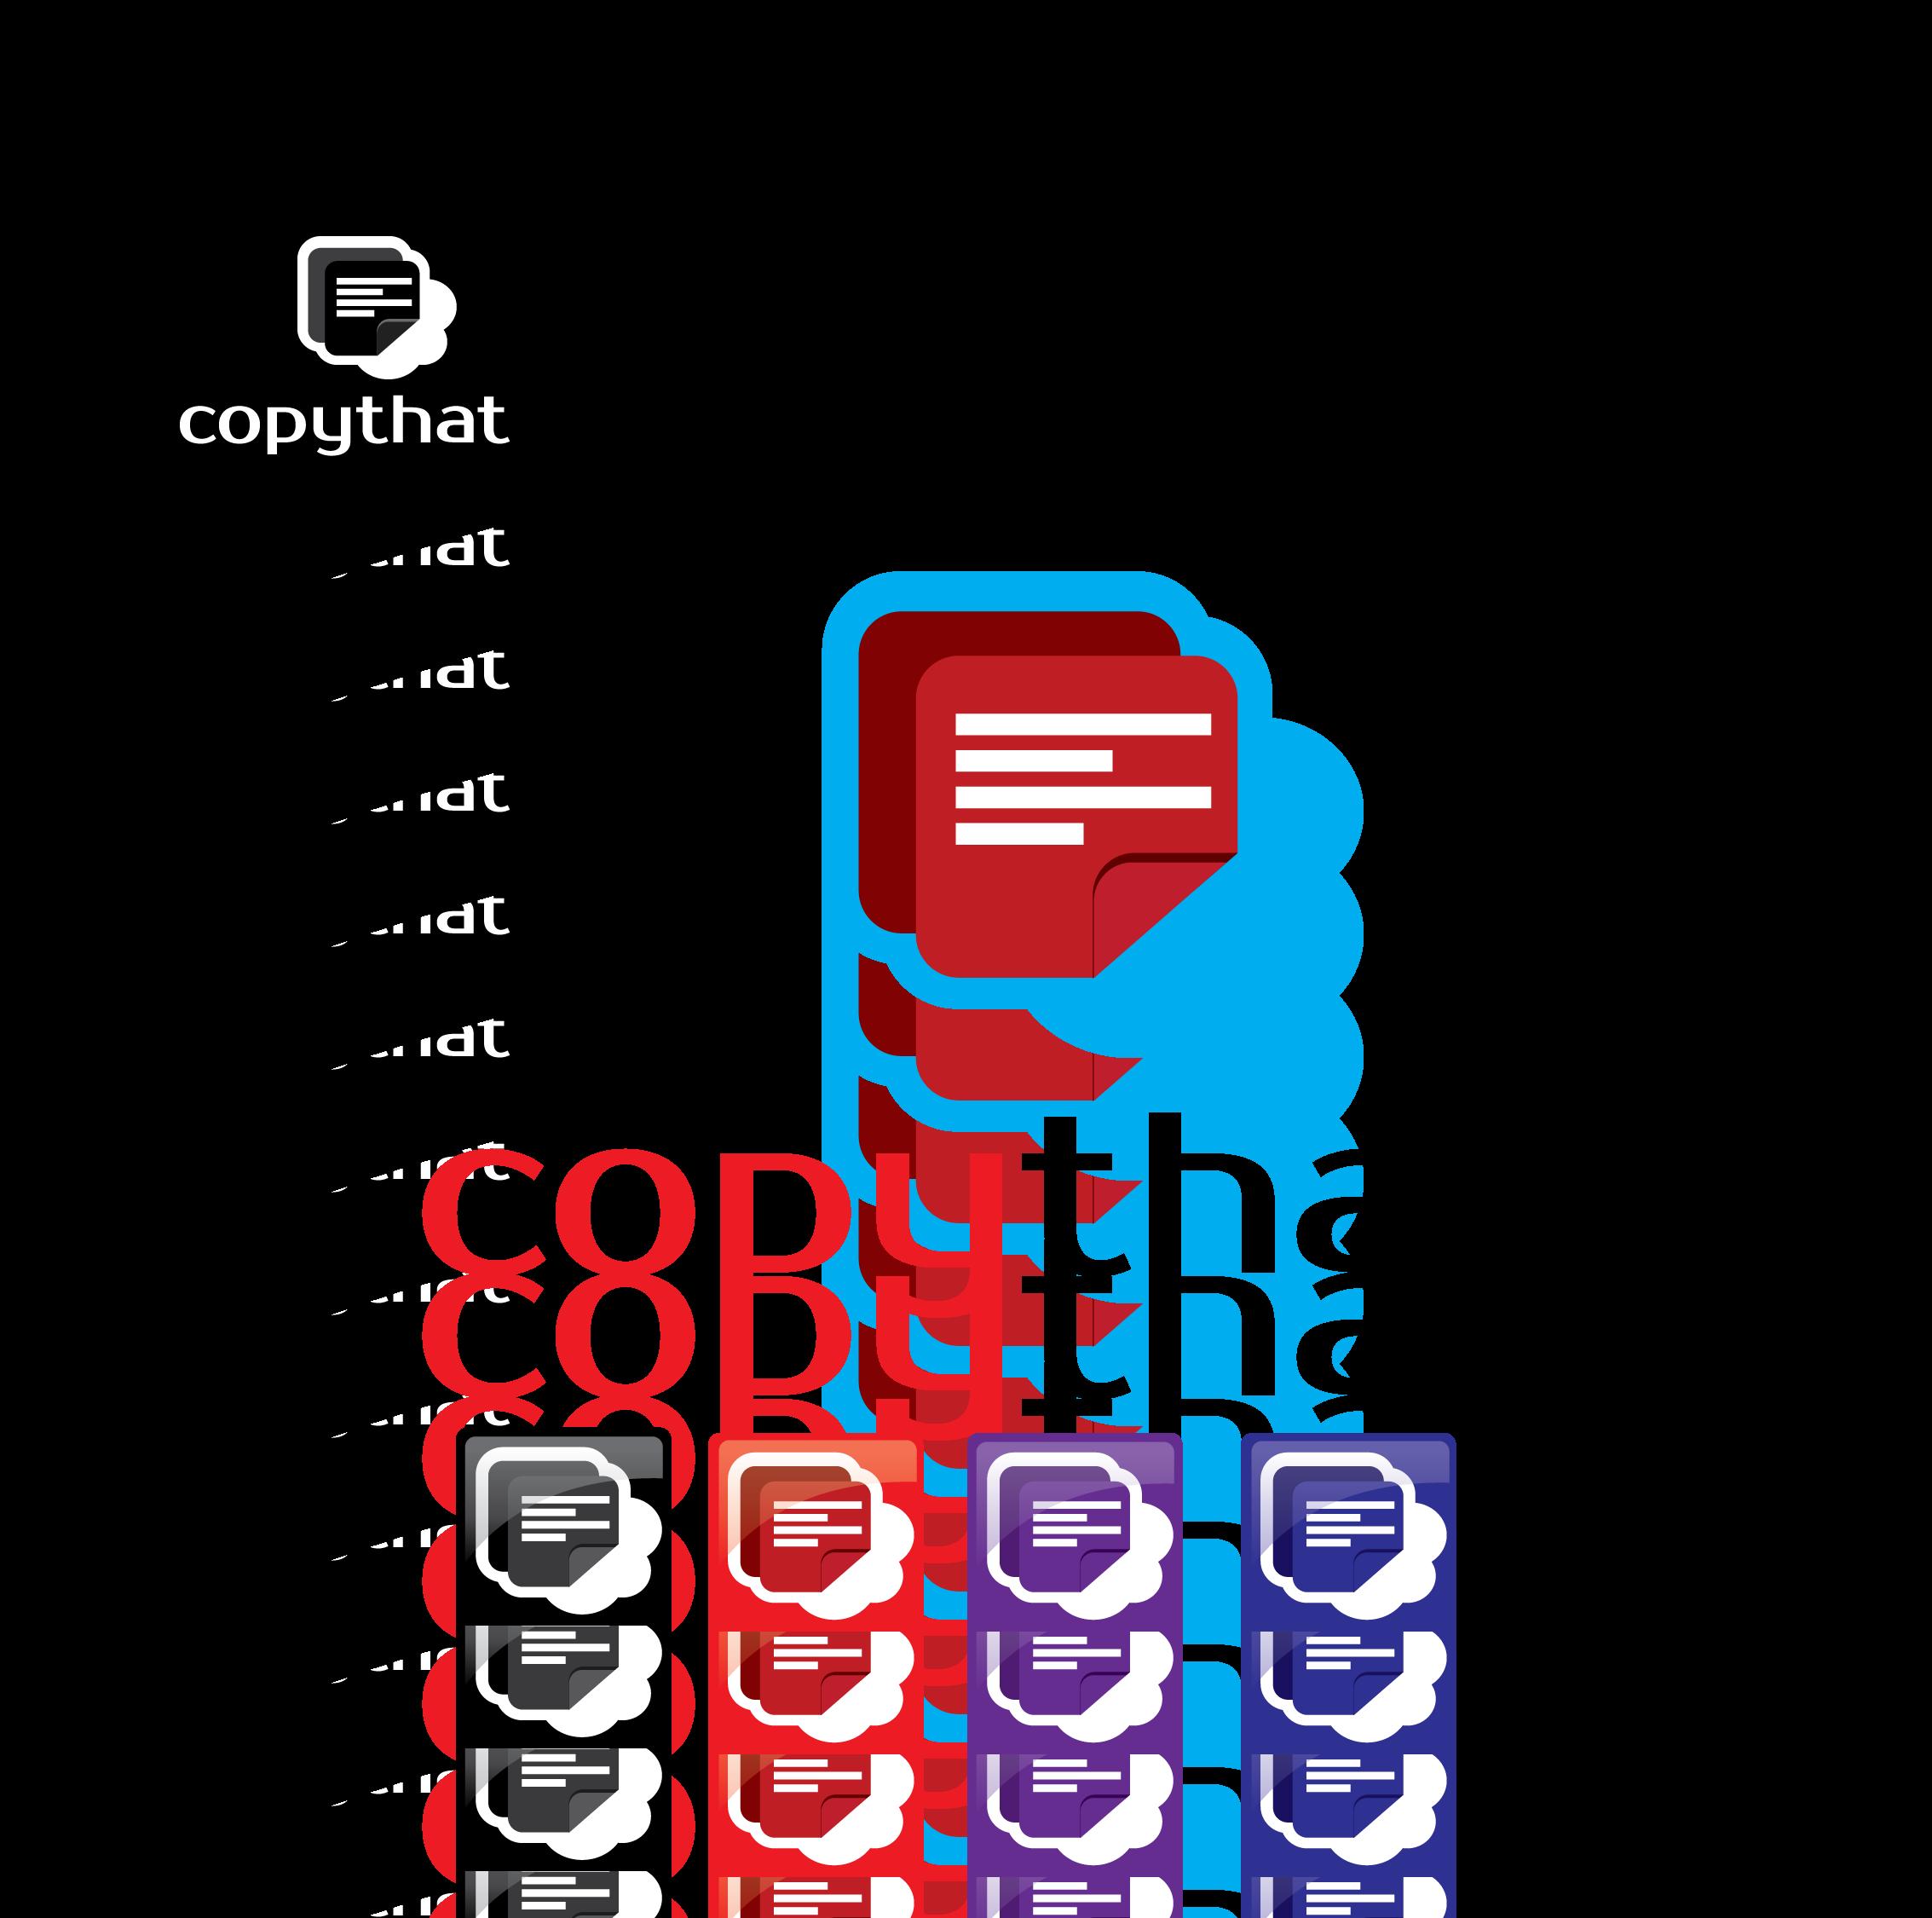 Logo Design by 354studio - Entry No. 50 in the Logo Design Contest Inspiring Logo Design for CopyThat.